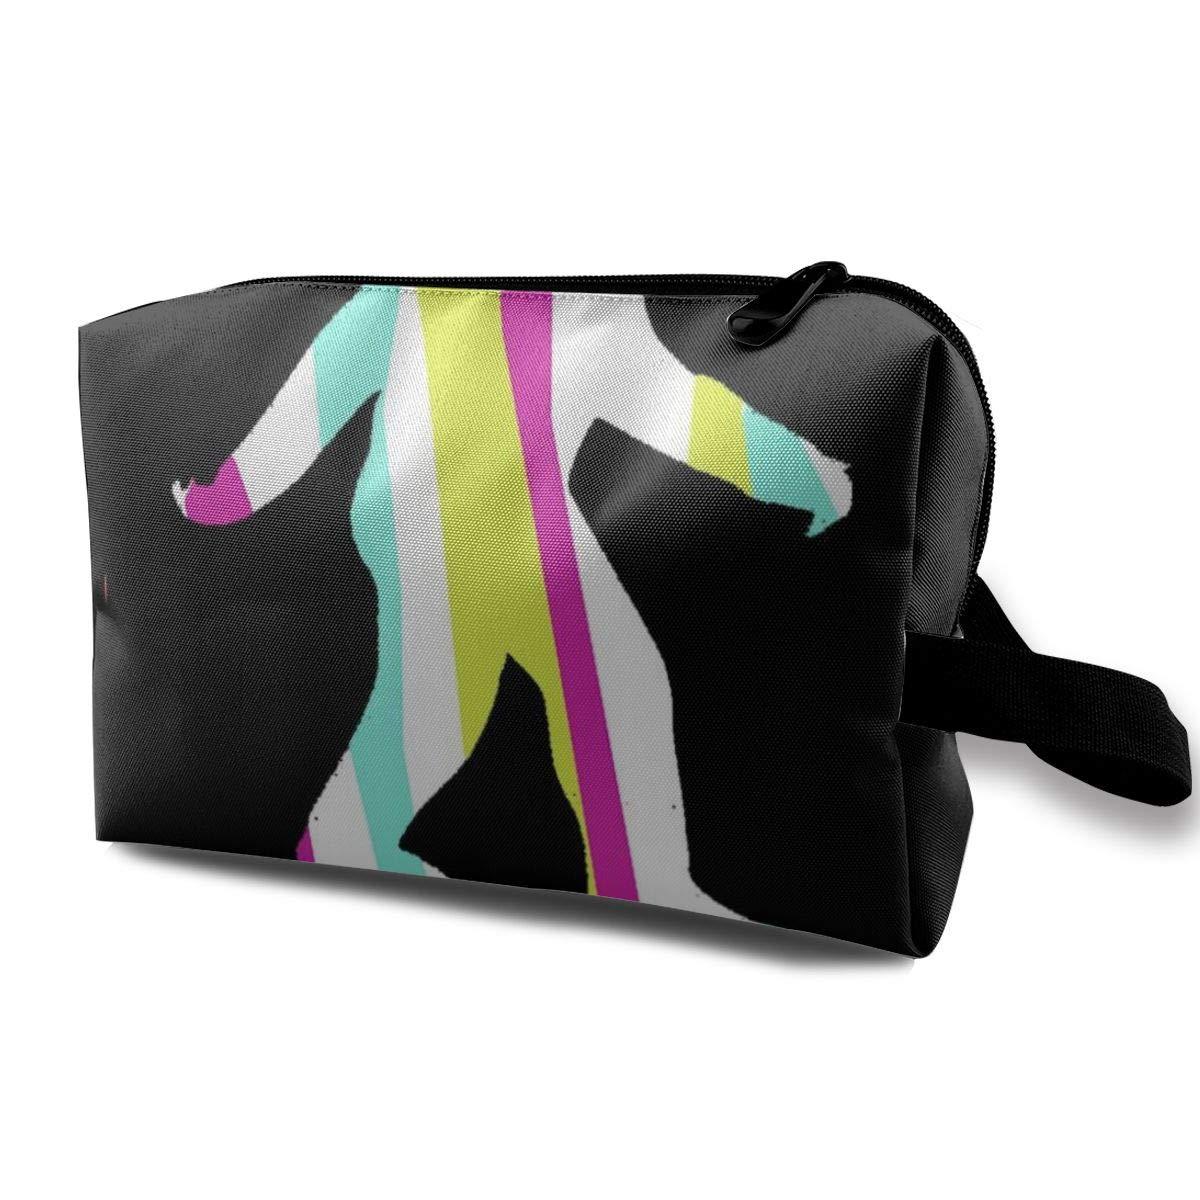 Makeup Bag Cosmetic Pouch GTA Yeti Multi-Functional Bag Travel Kit Storage Bag